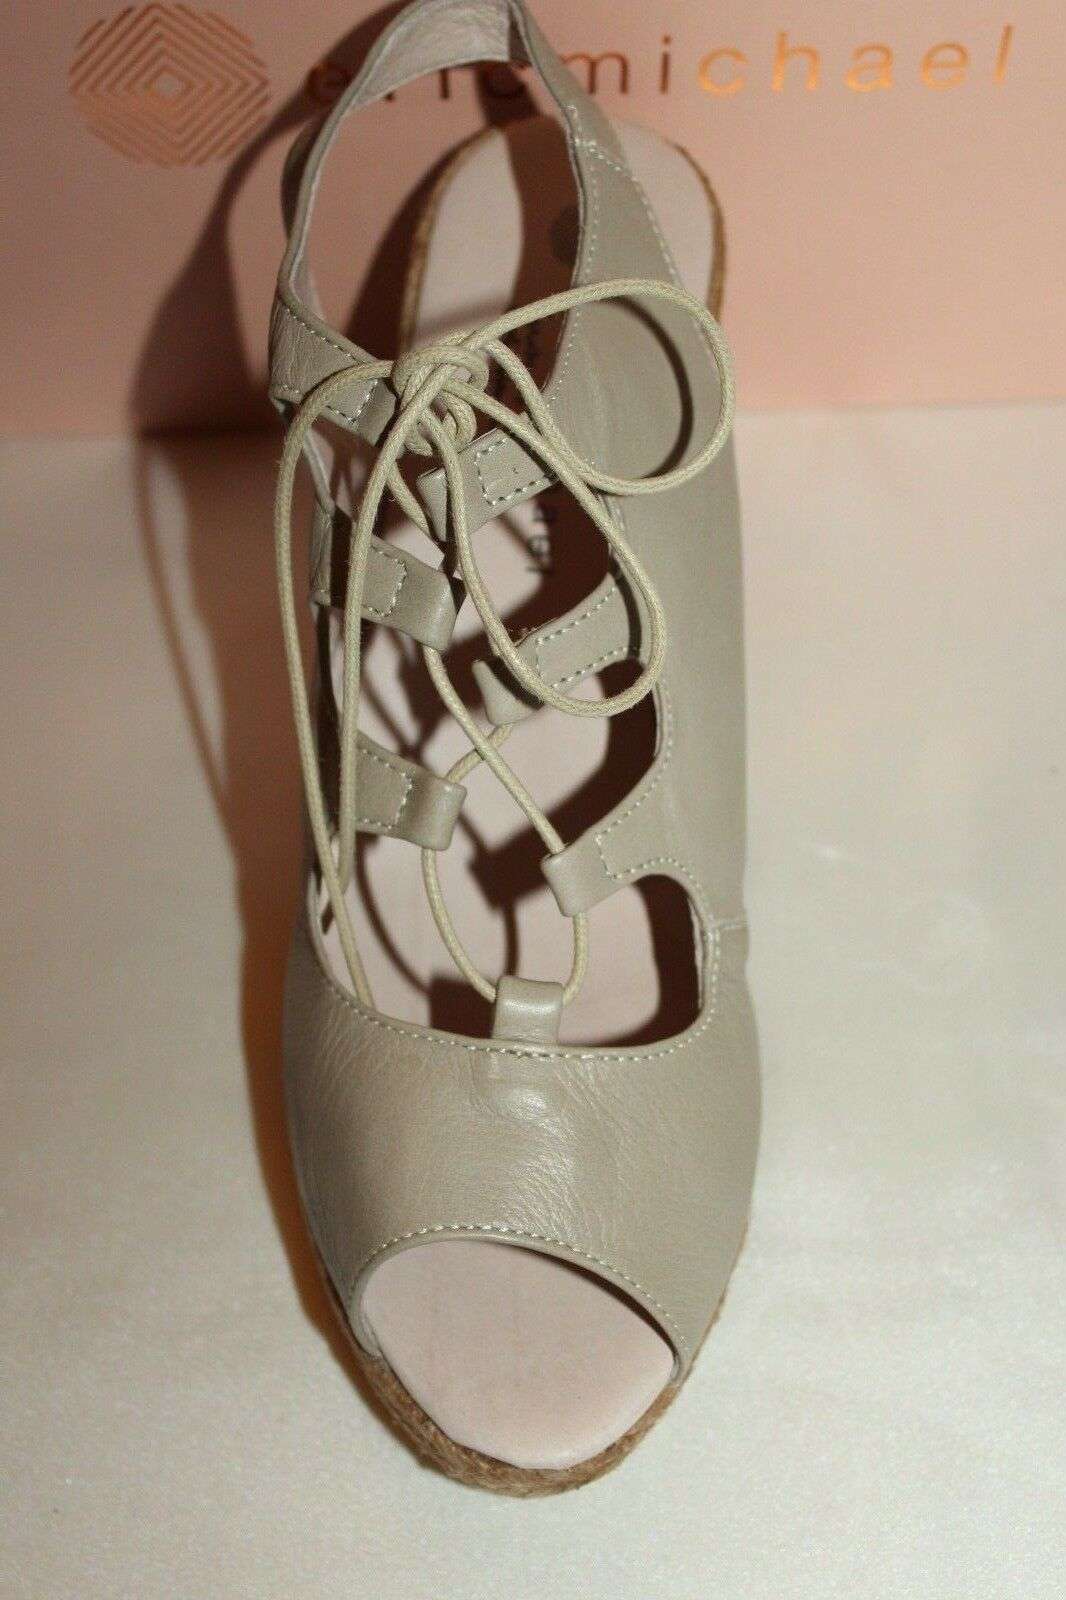 NEW NIB ERIC MICHAEL Taupe Leather GOSSIP Lace Up Jute Jute Jute Wedge Sandal EU41  119 10b712